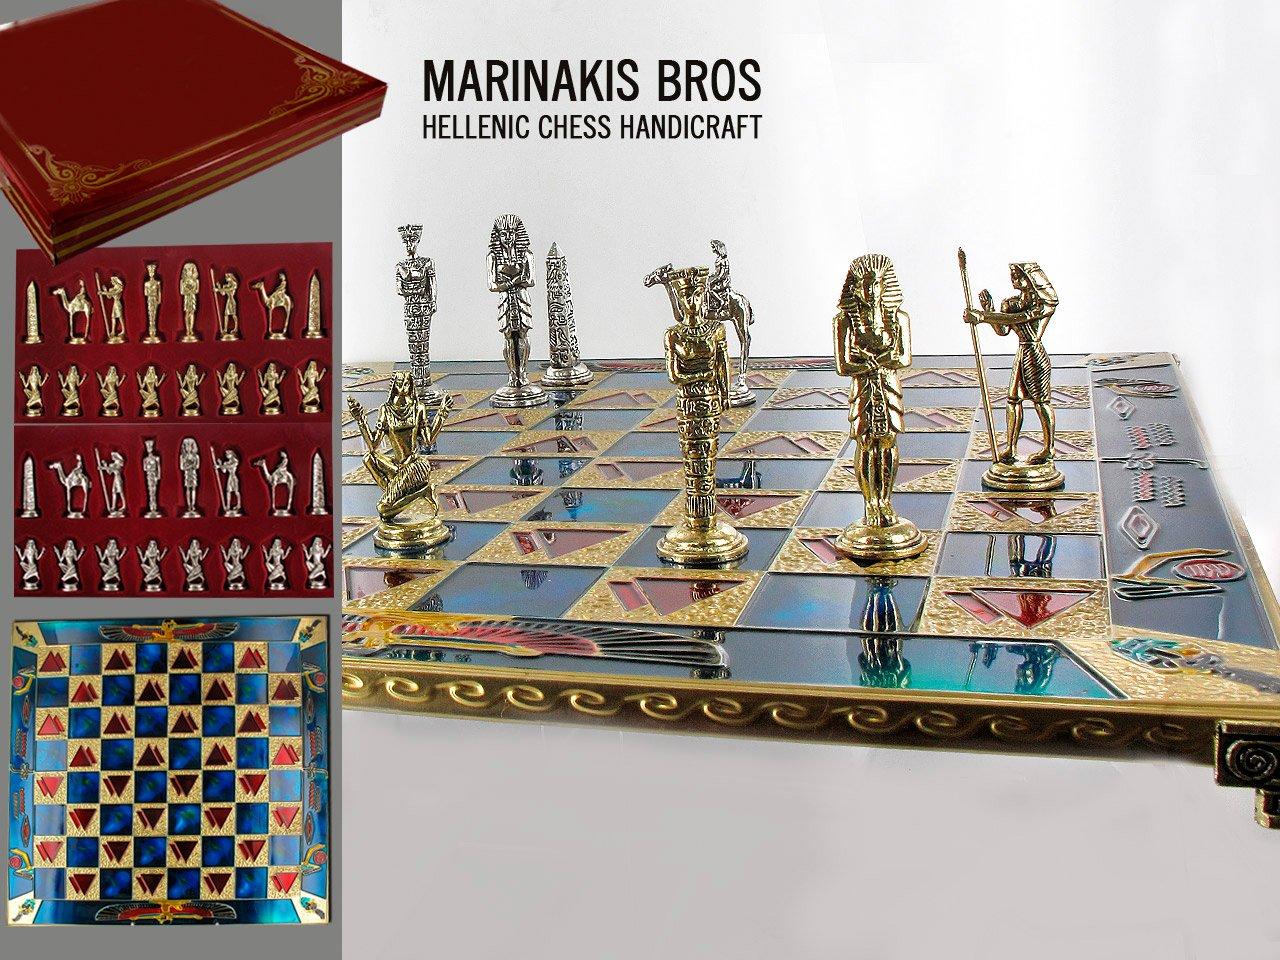 MARINAKIS BROSS Collection Egyptian Chess Set / Ägyptische Schach-Set Schach Schachspiel aus Metall 43x43cm 7,15kg Premium-Qualität Delux Chess Set, Gift box, Beste quality MARINAKIS BROSS, Greece 086-4501